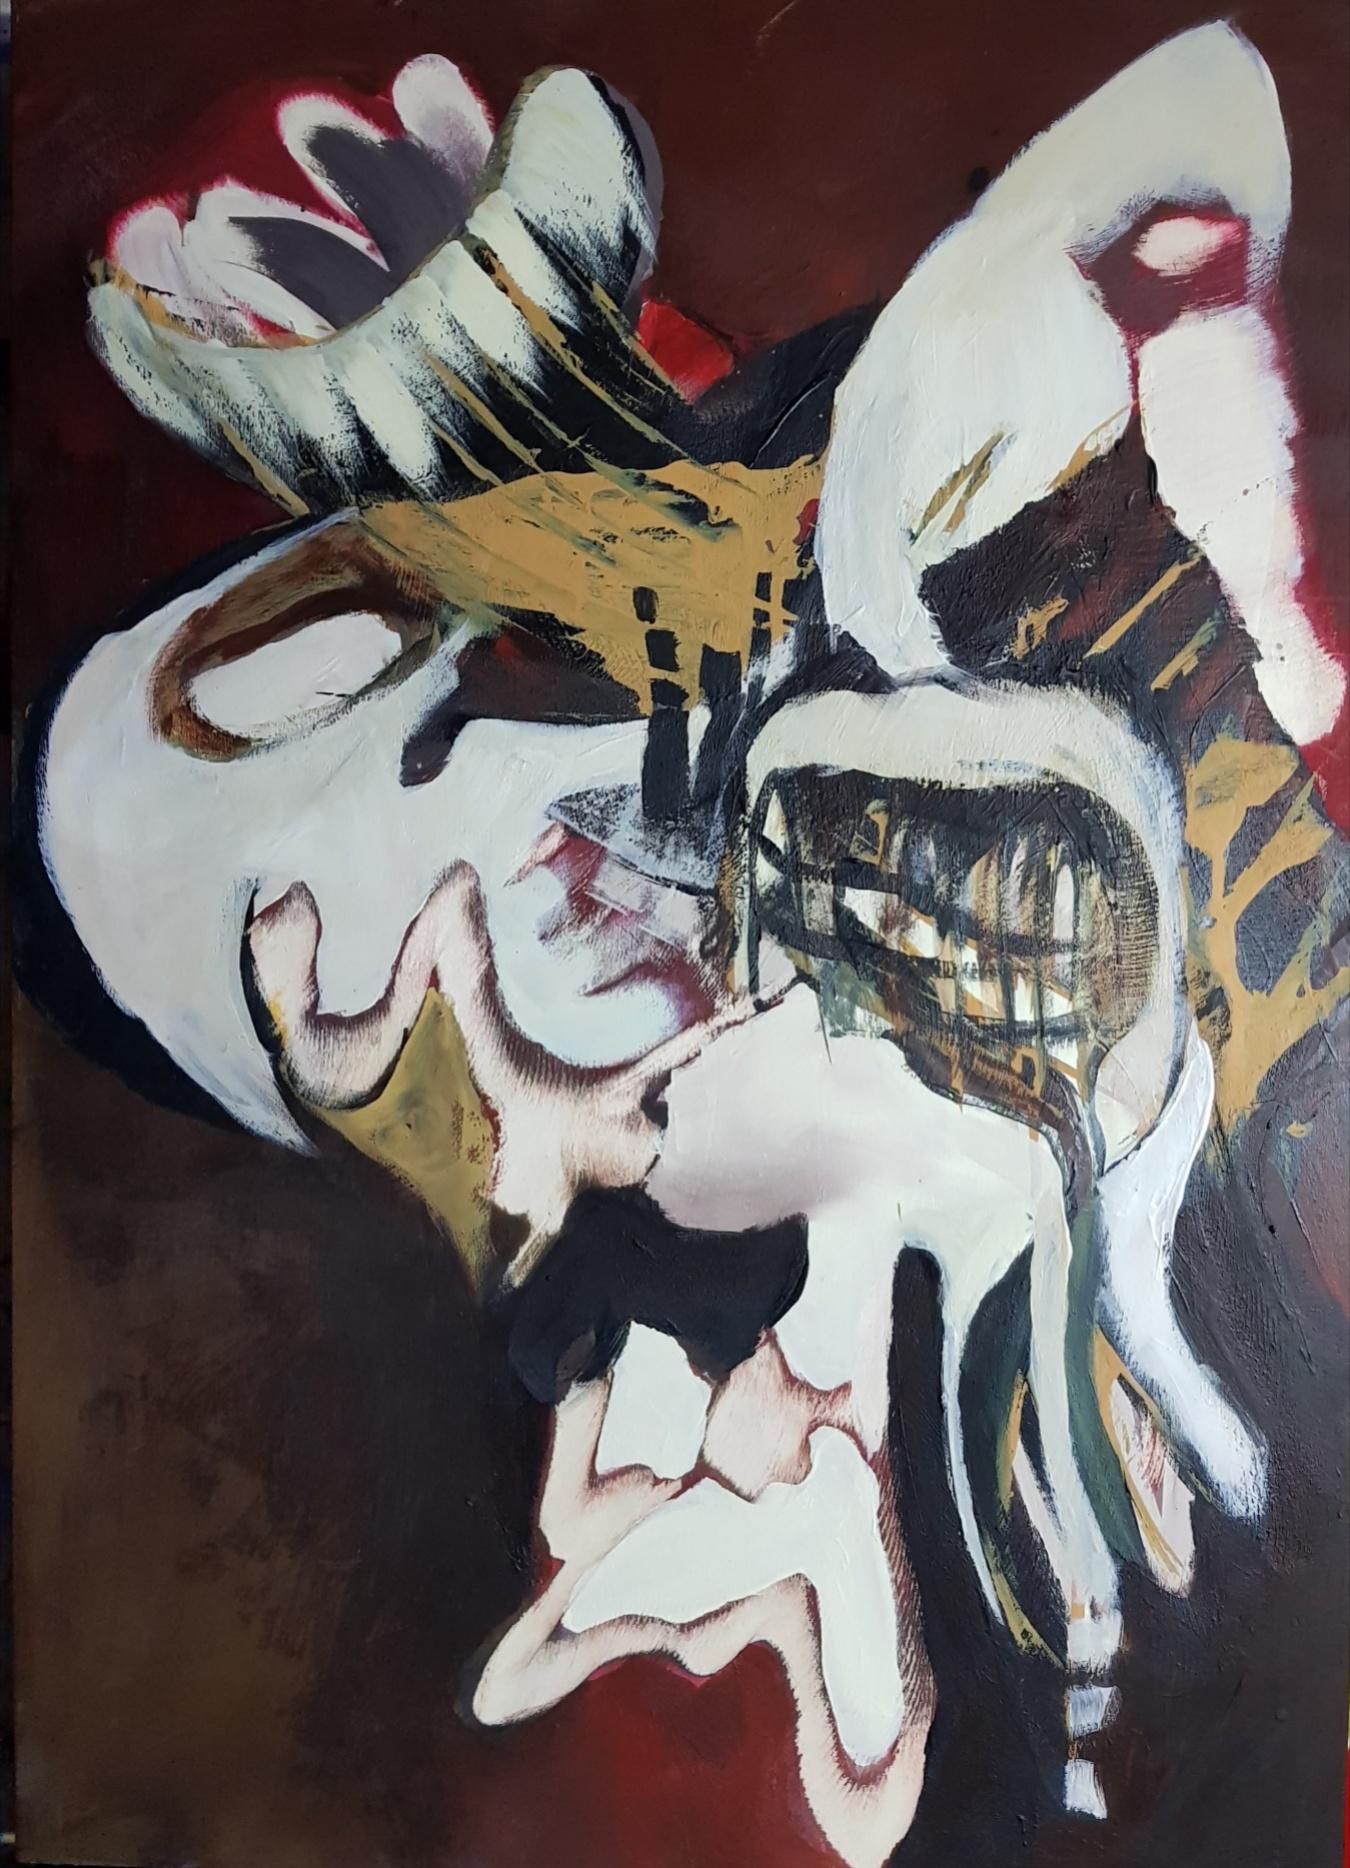 o.T., 2016, Acryl auf Holz - Winkelschleifer, 60 x 50 cm